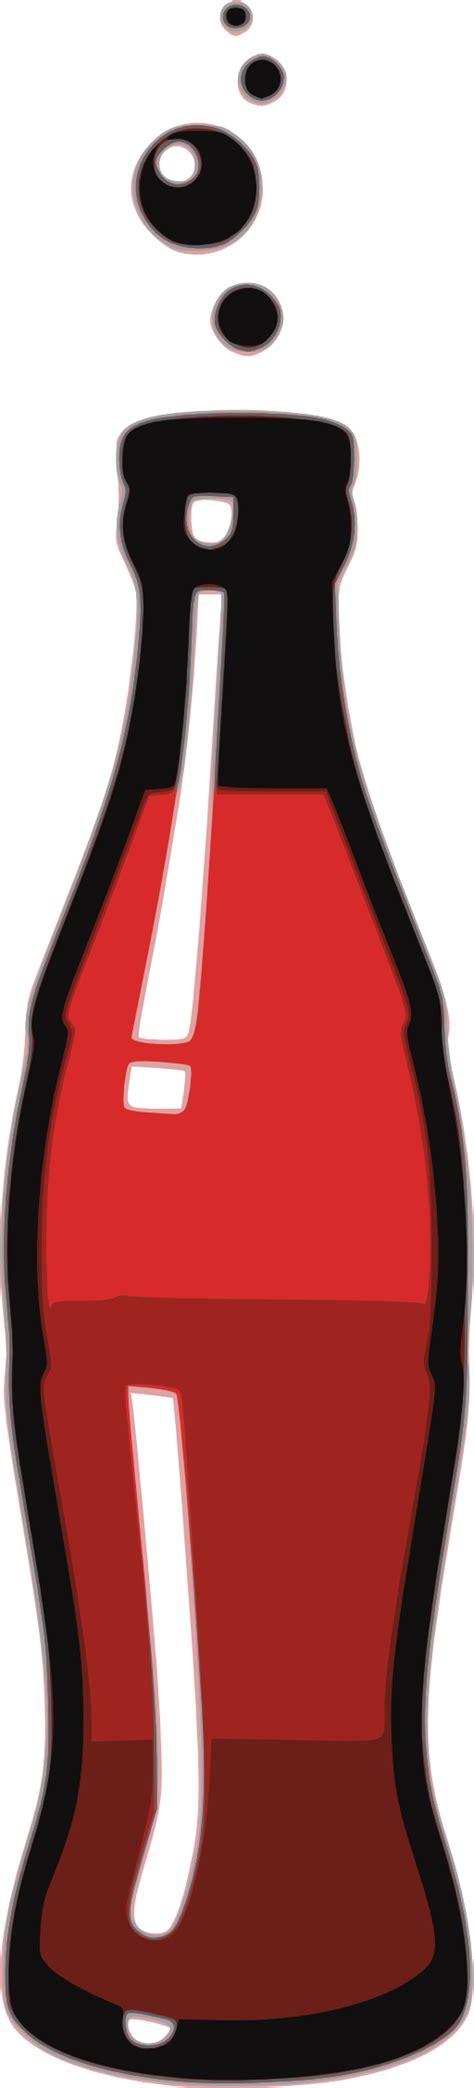 Clipart Soda soda bottle clipart